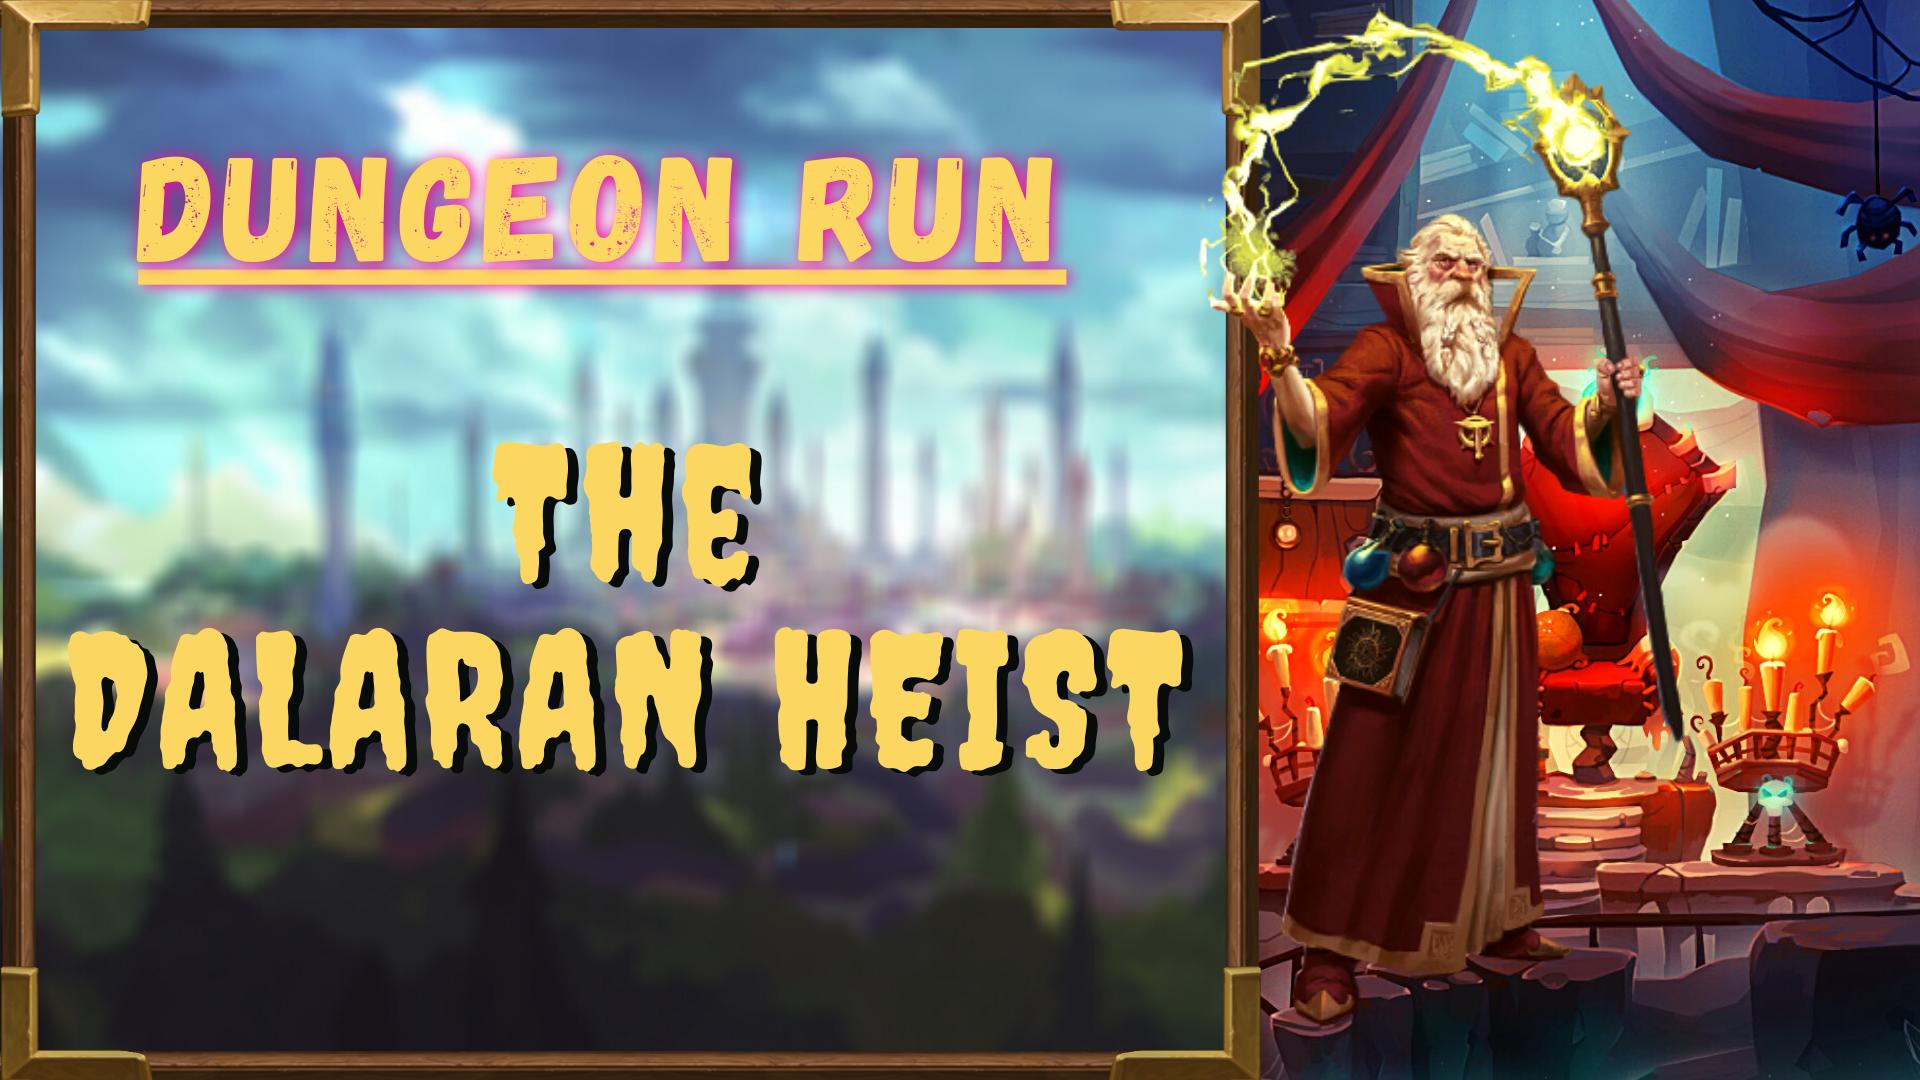 Dungeon run: The Dalaran Heist Zafari - e2p.com